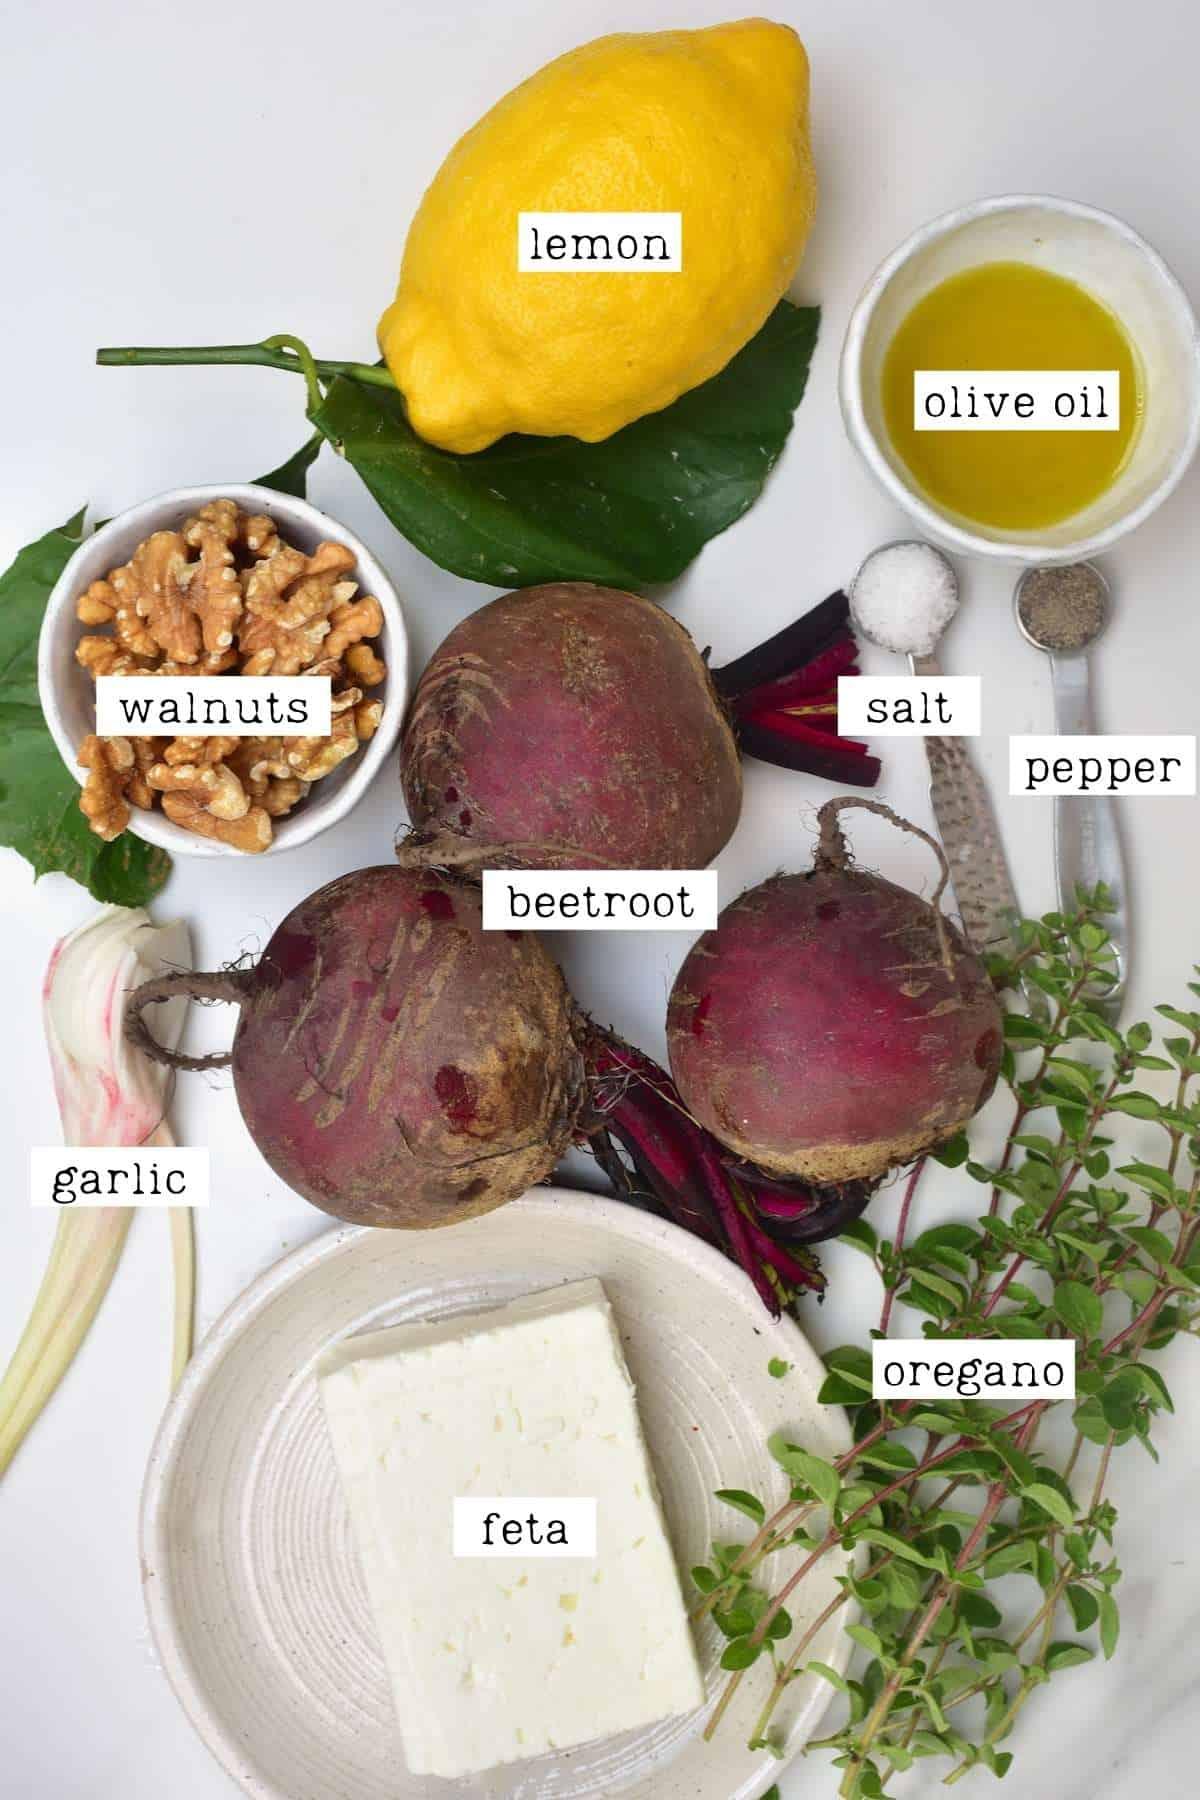 Ingredients for beetroot pasta sauce